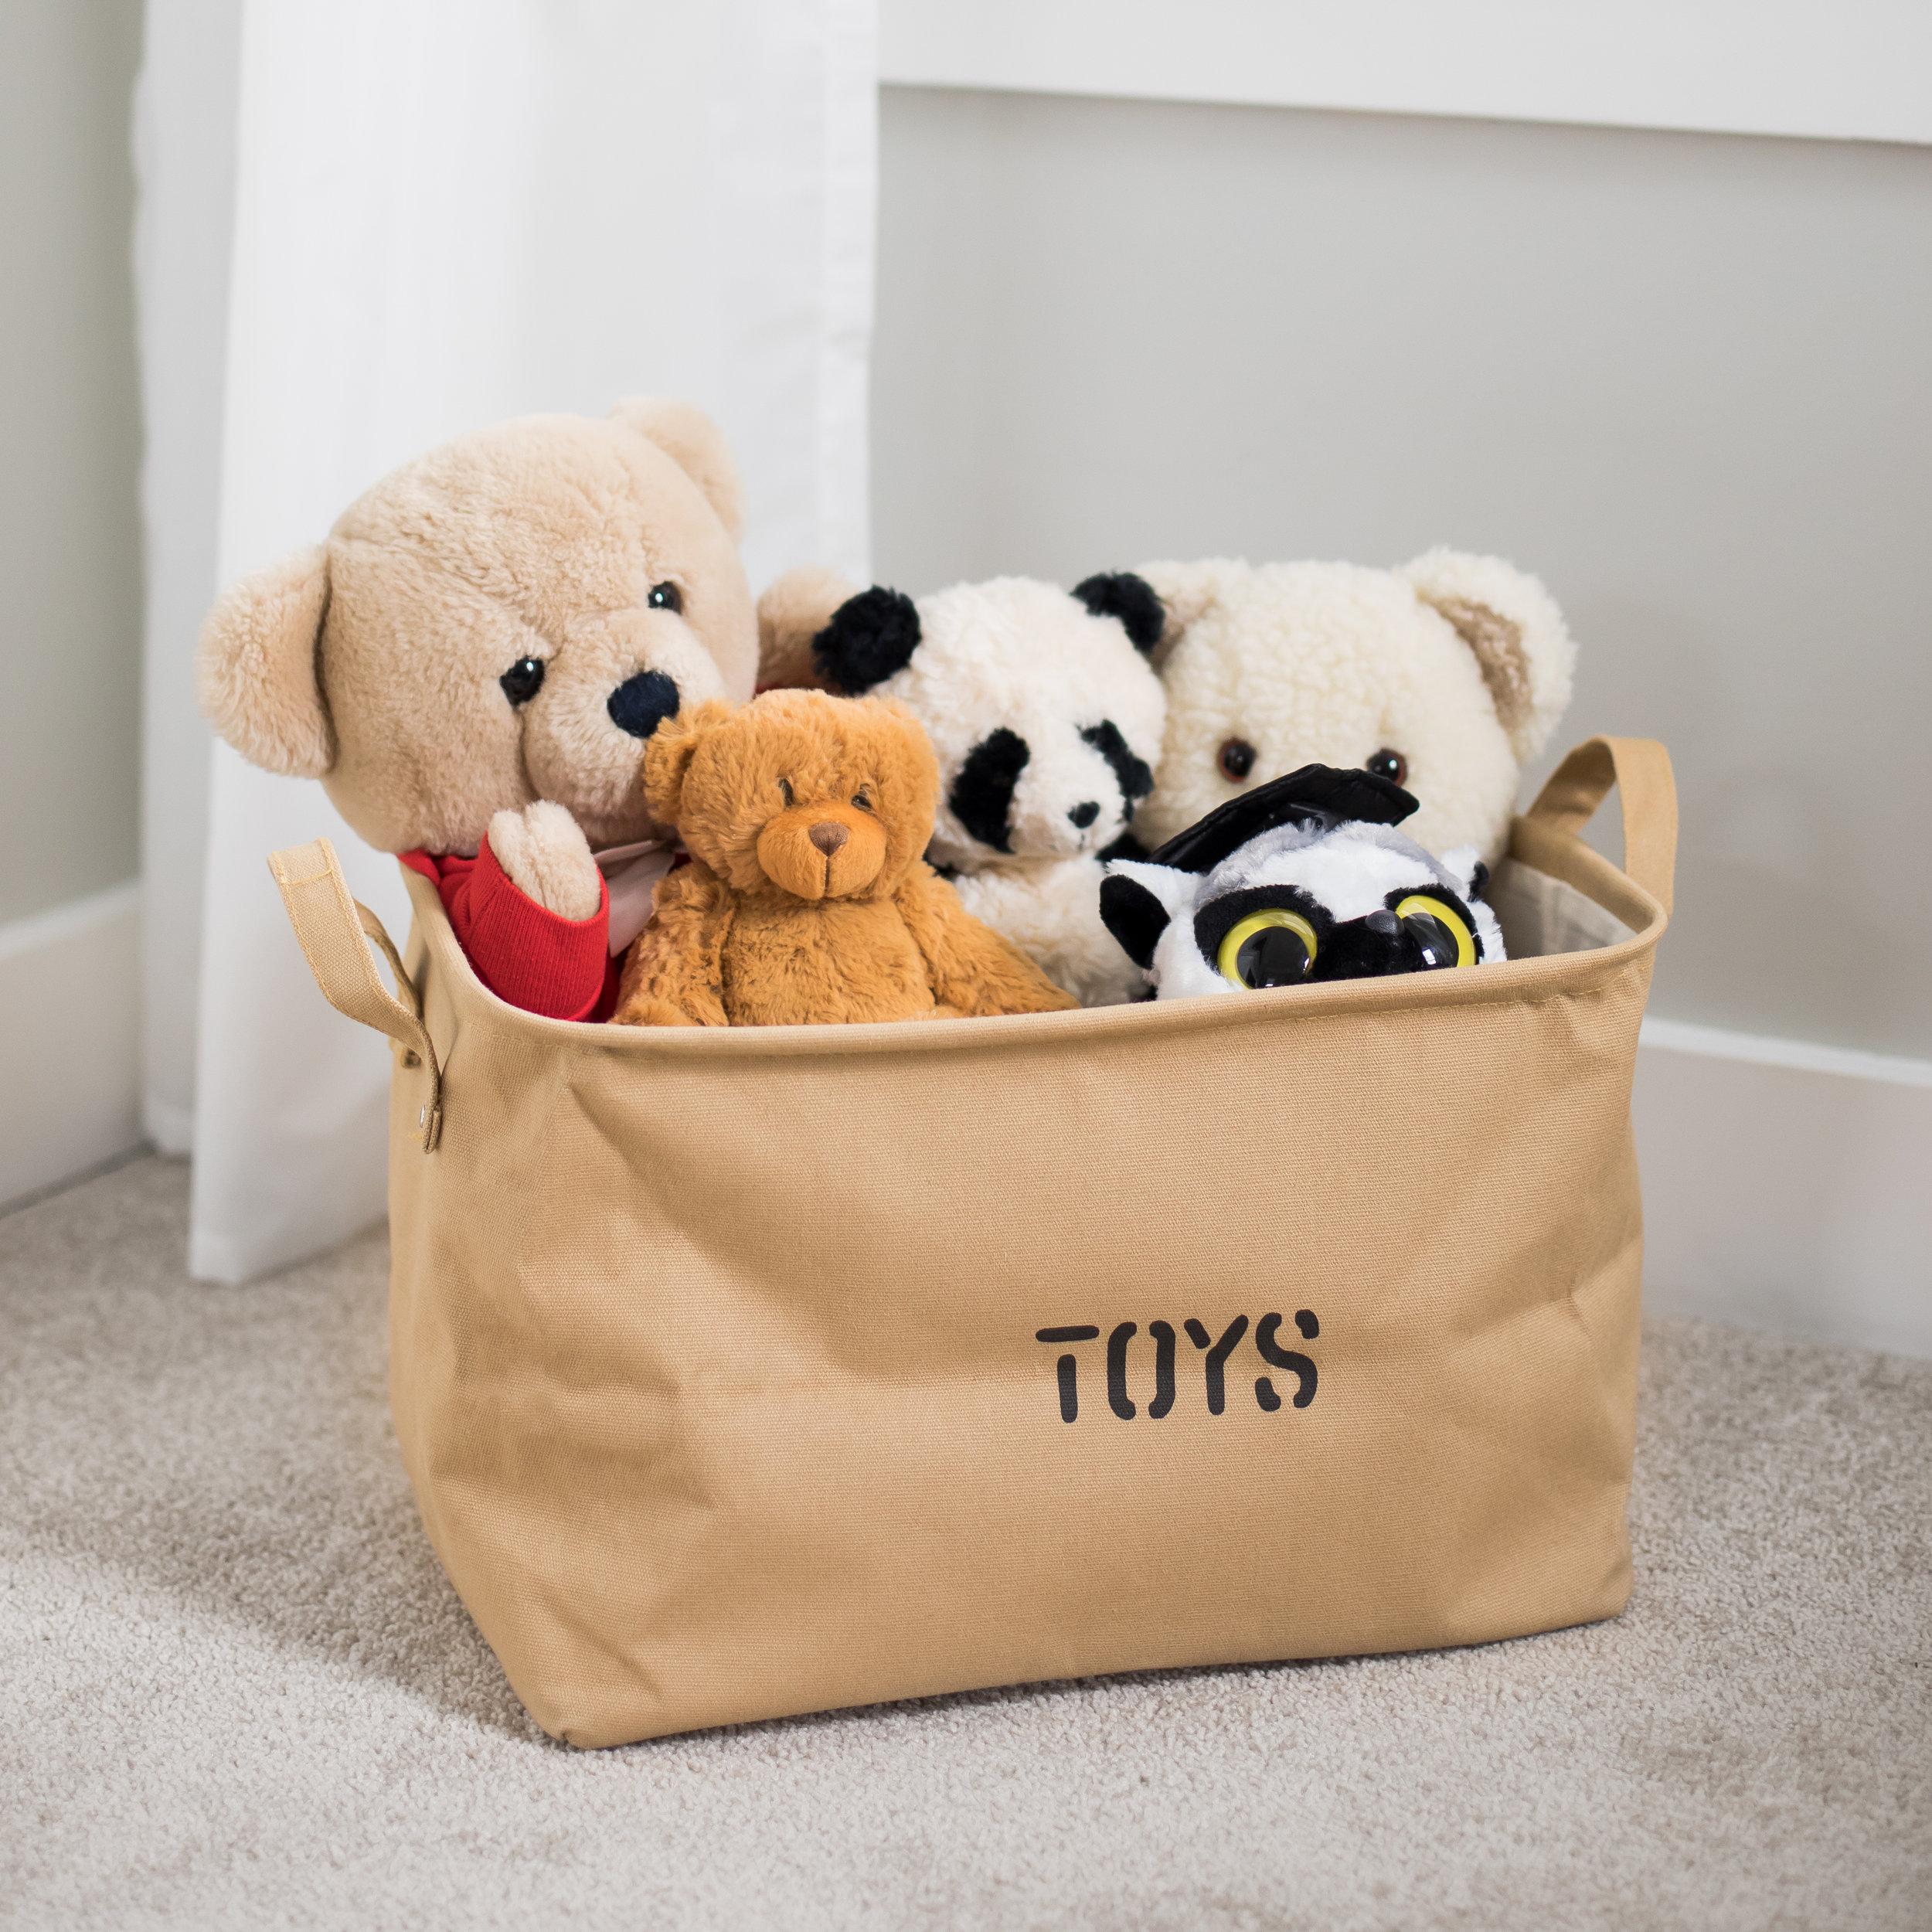 Toy tote-lifestyle3.jpg